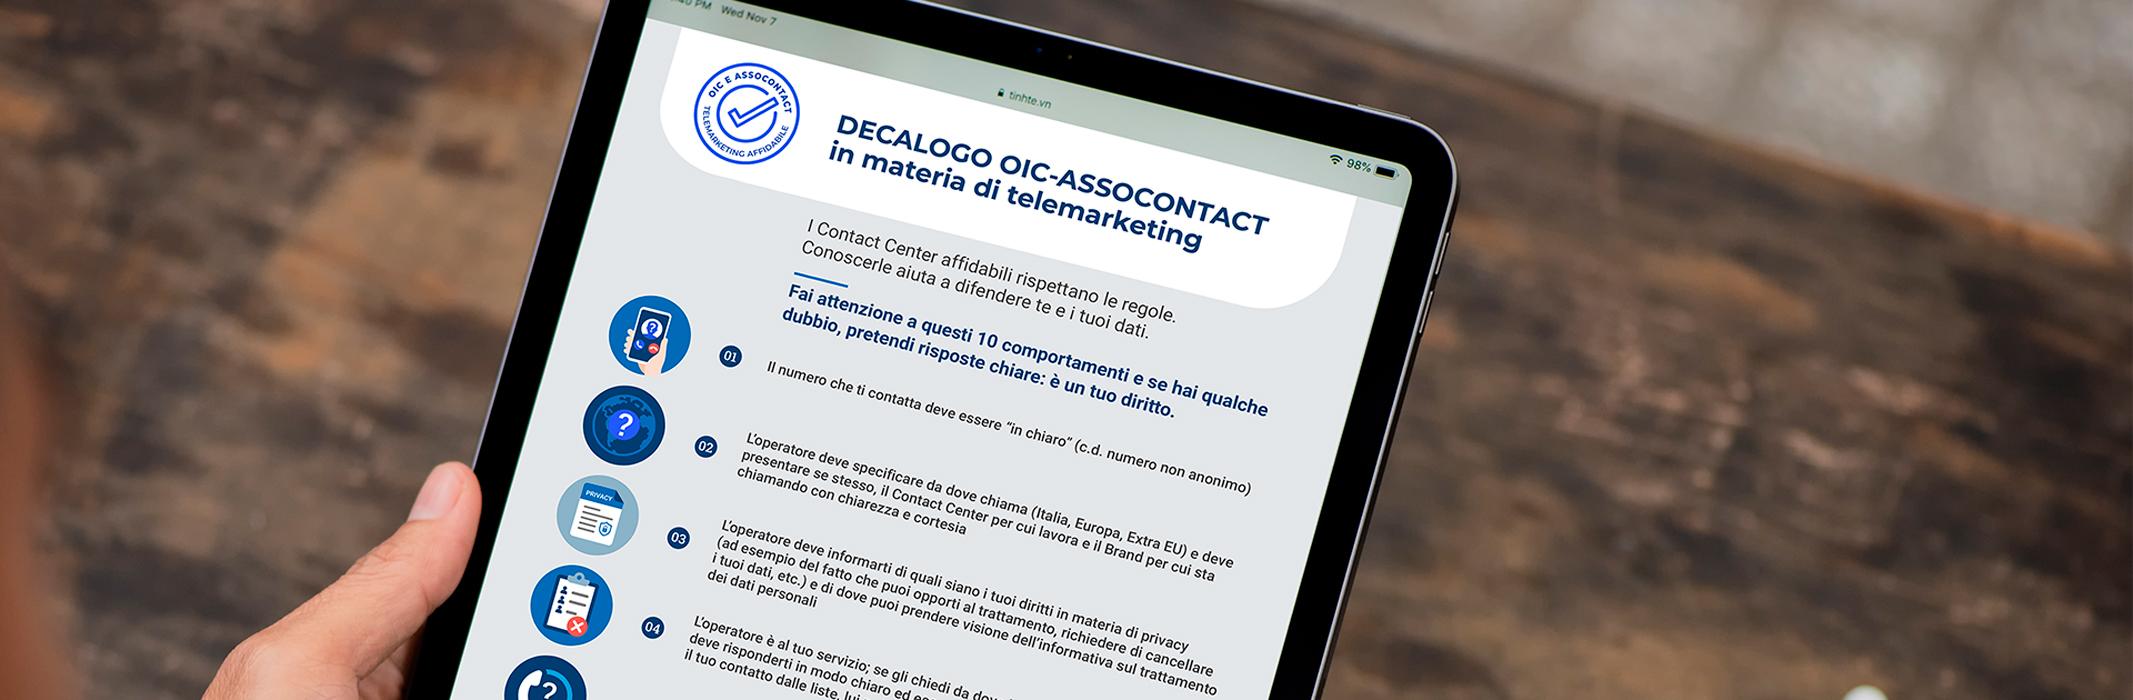 IL DECALOGO ASSOCONTACT-OIC PER I CONSUMATORI